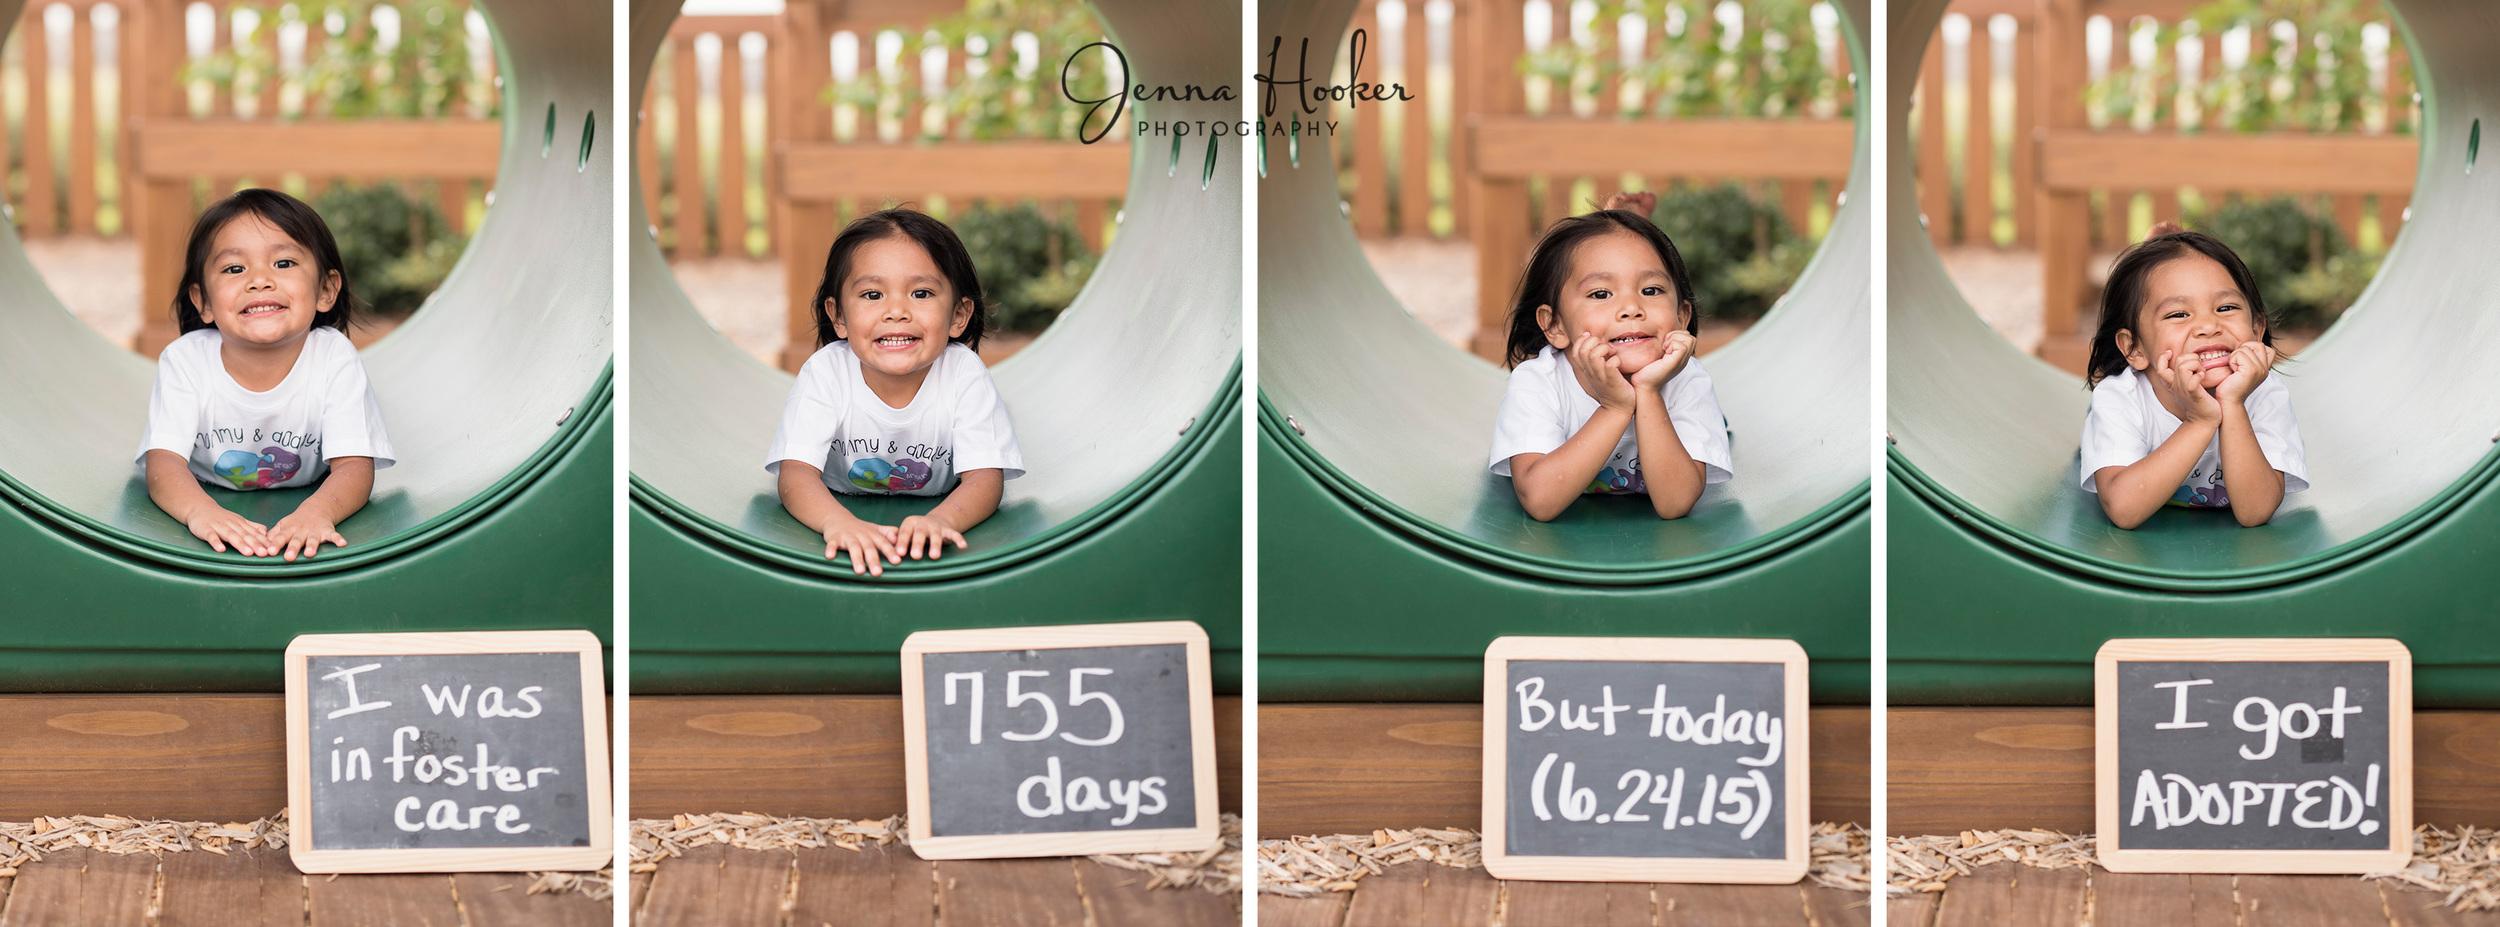 adoption photography ideas